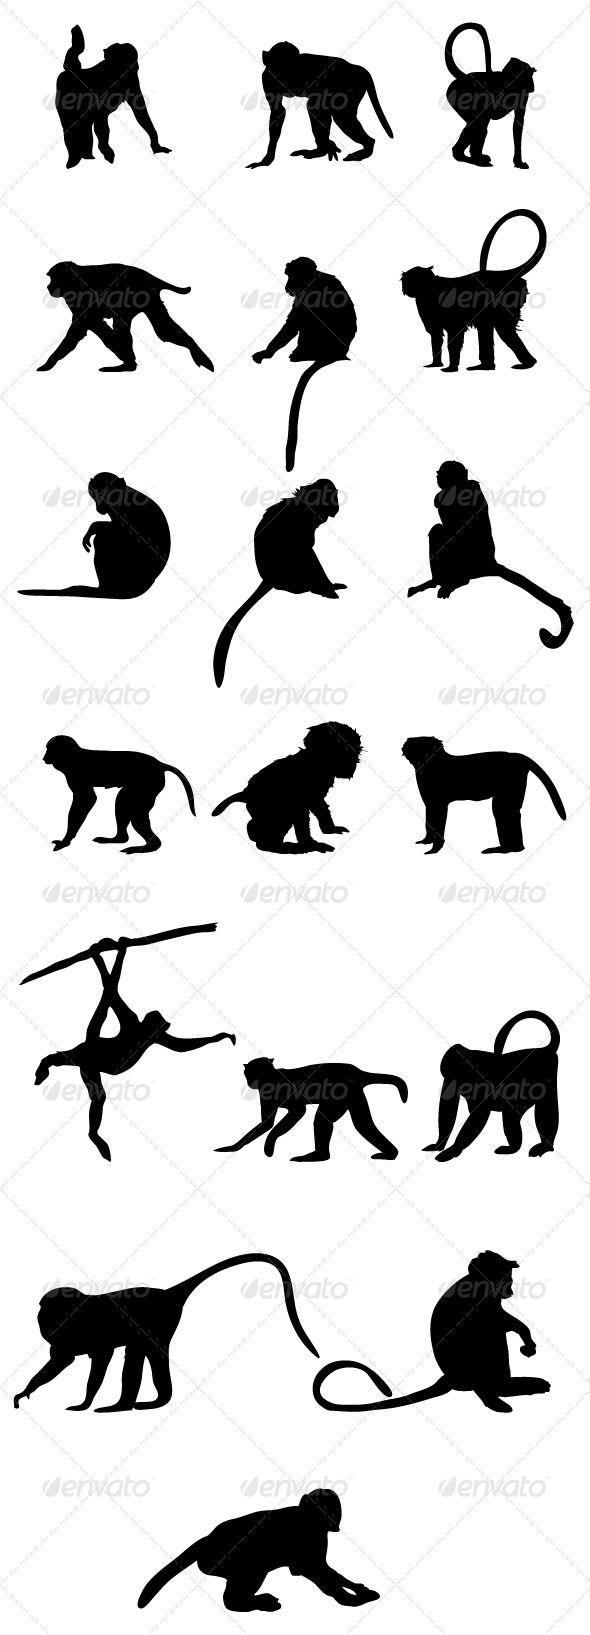 590x1635 Monkey Silhouettes Monkey, Tattoo And Silhouettes